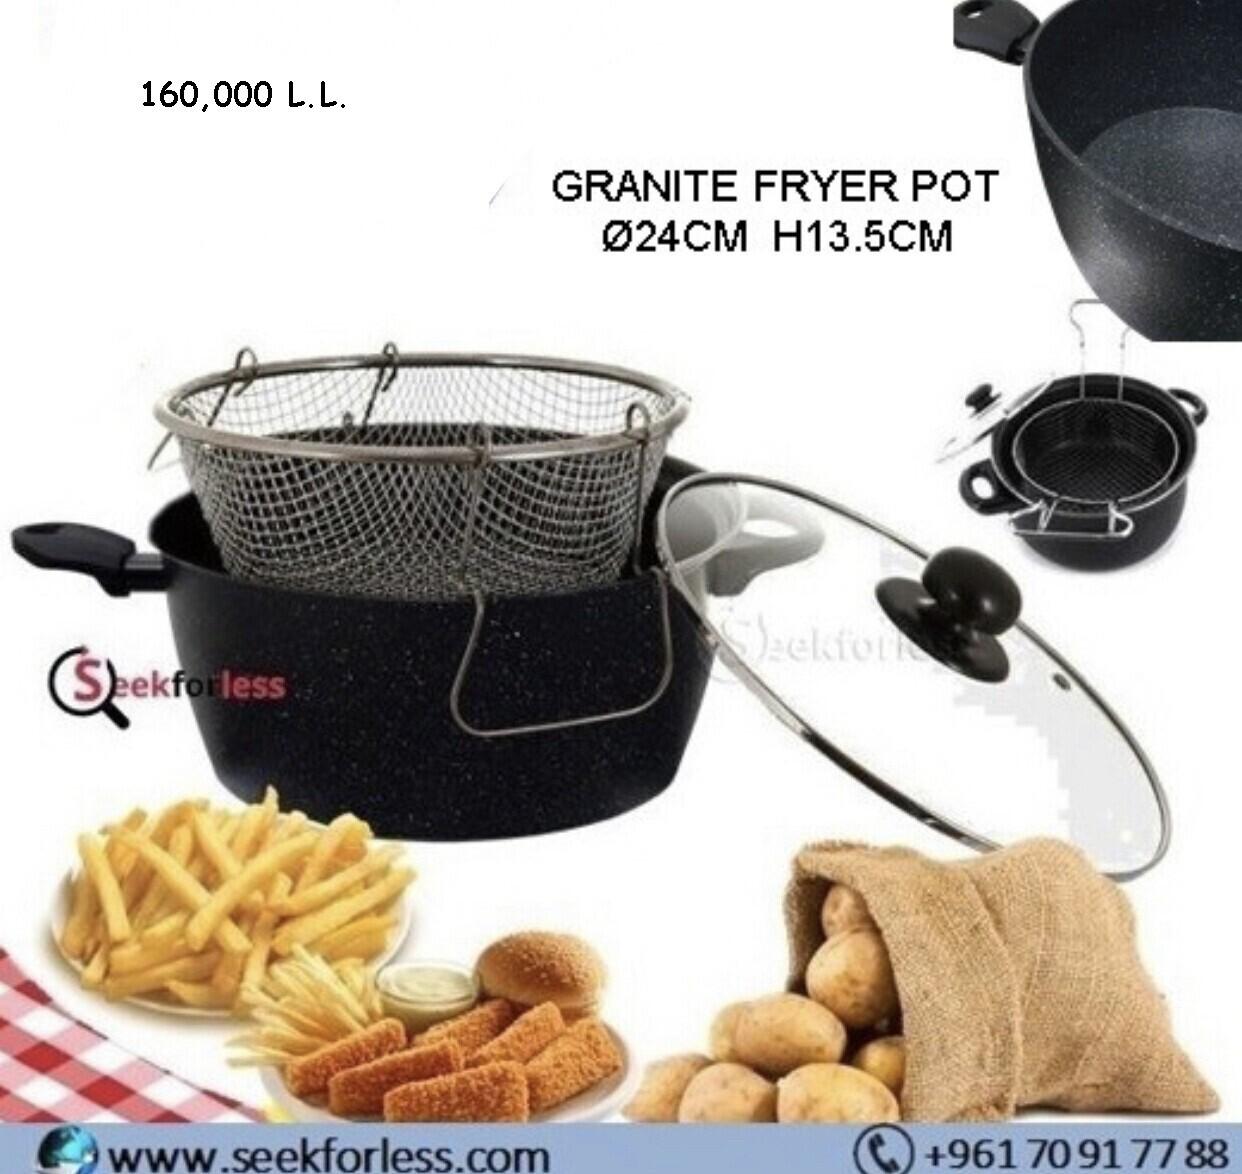 Granite Fryer Pot (24CM)